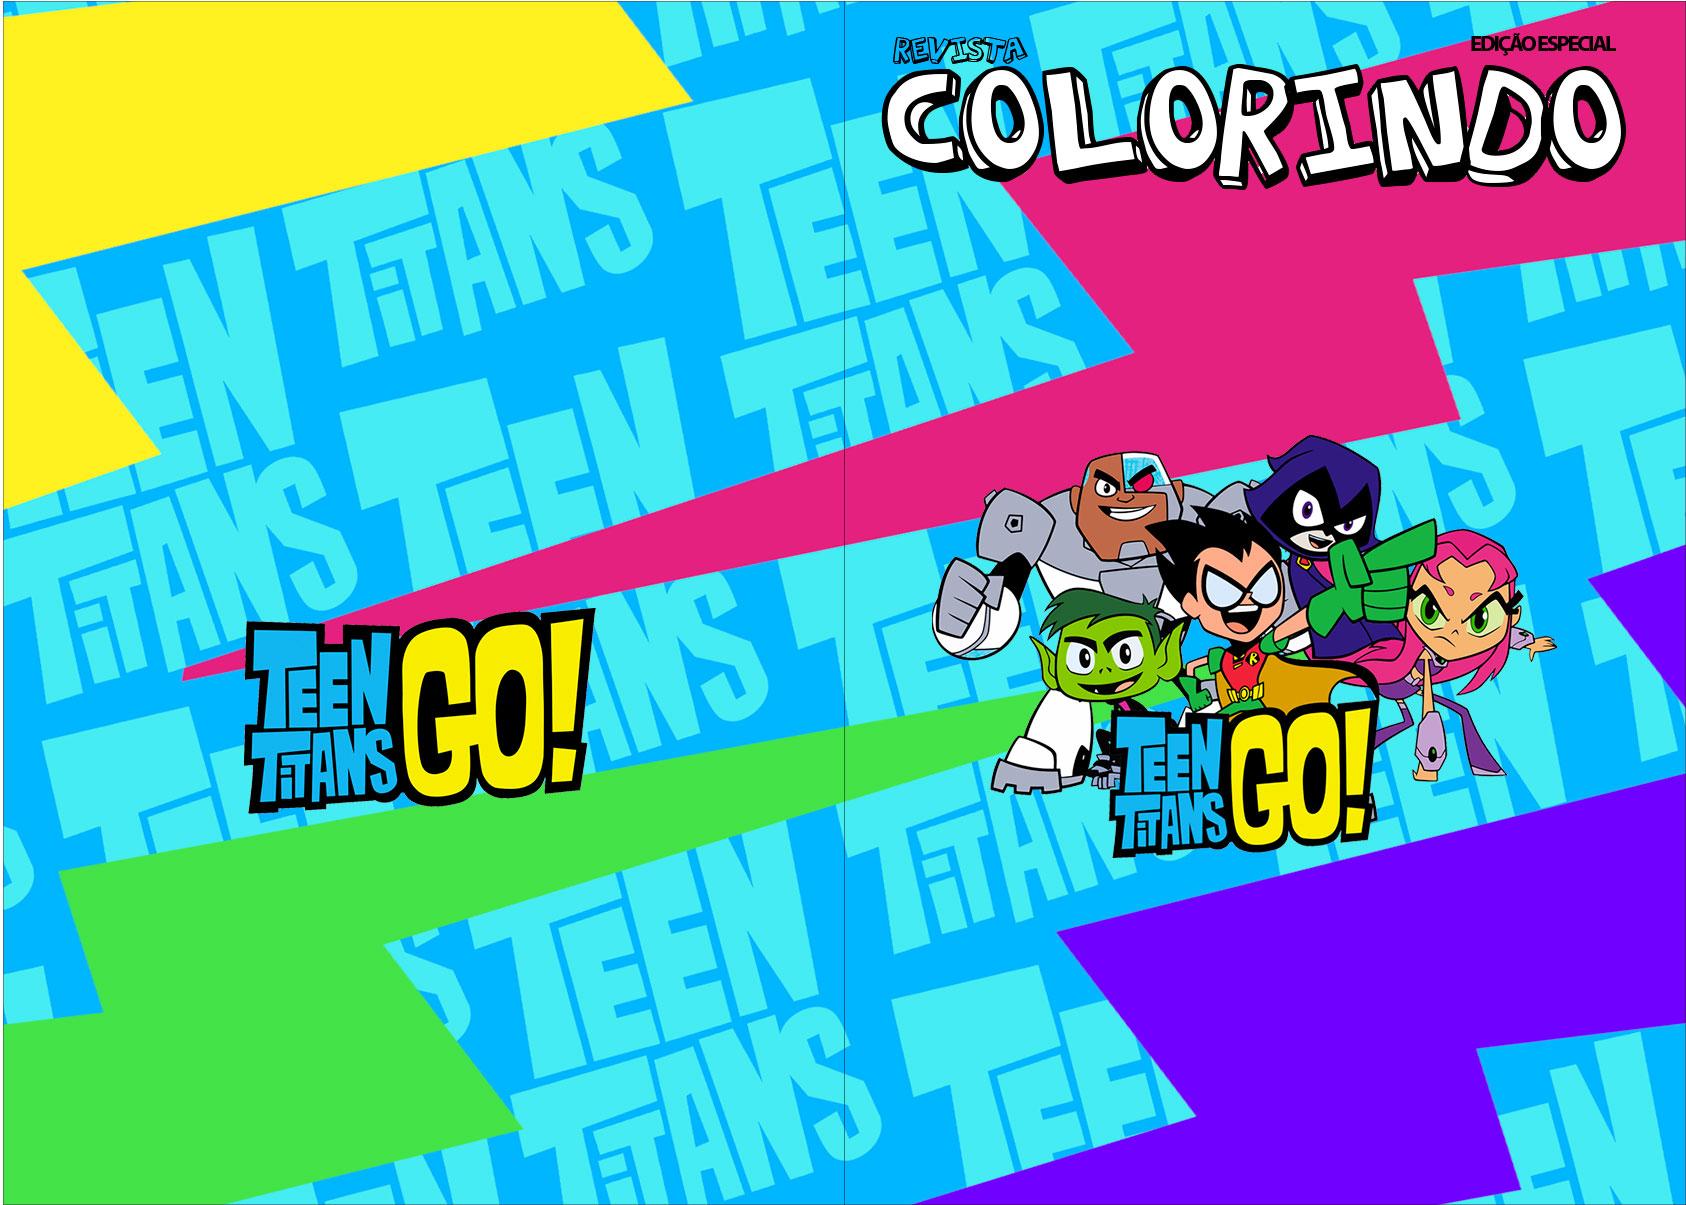 Revista Colorindo Jovens Titans